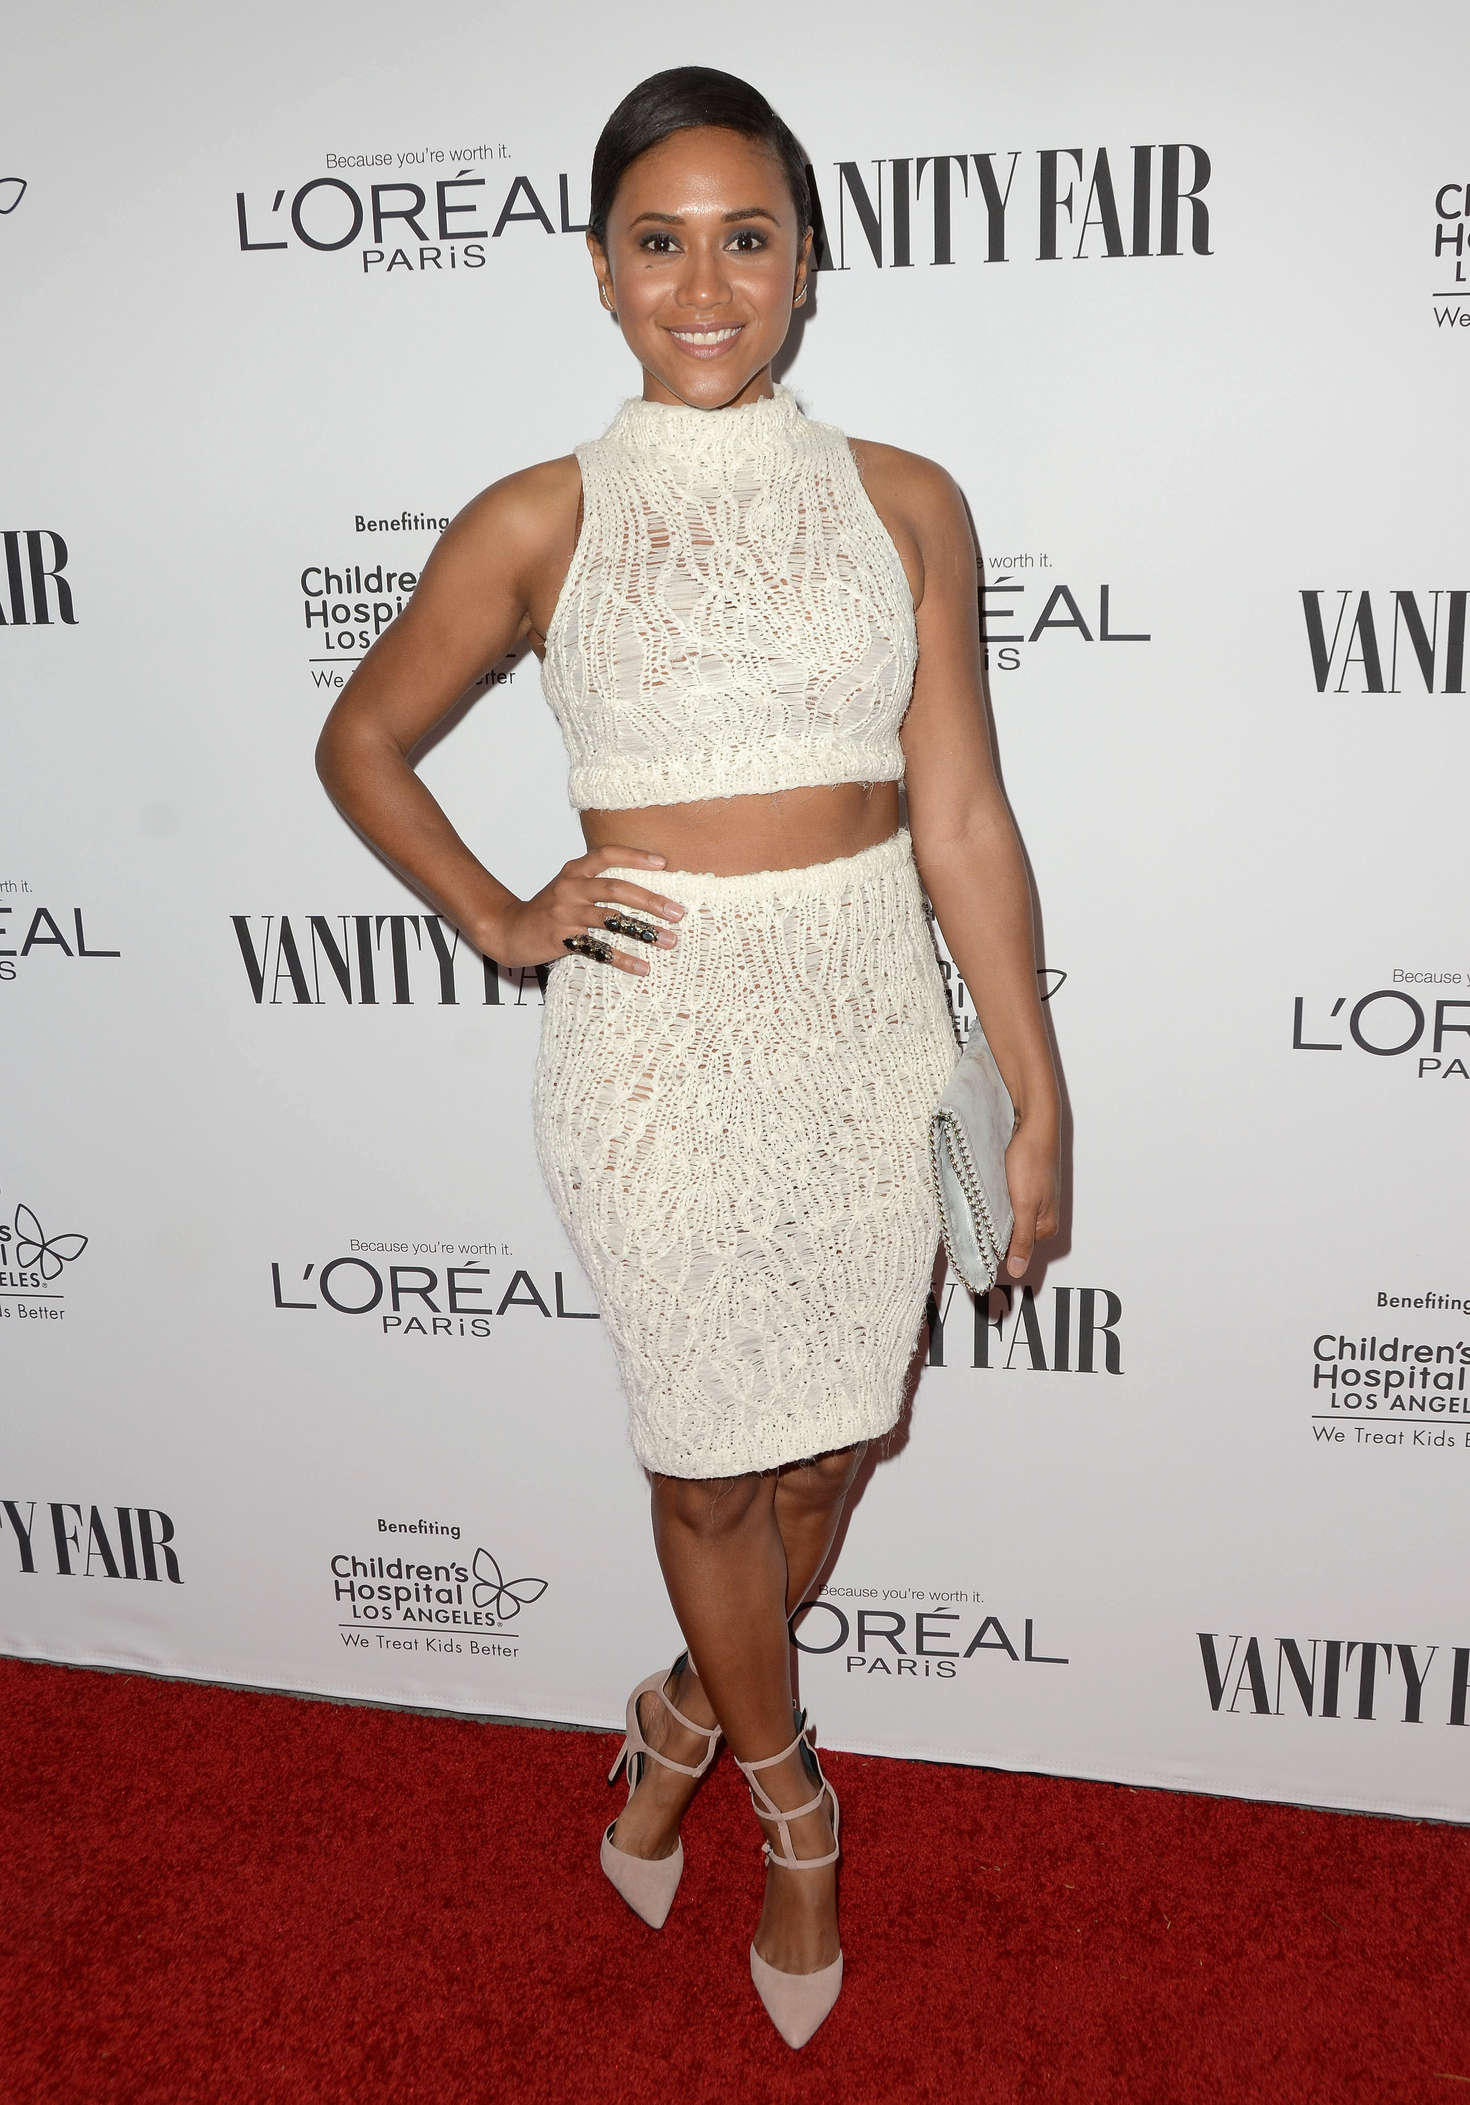 Maya Washington Vanity Fair LOreal Paris and Hailee Steinfeld host DJ Night in West Hollywood